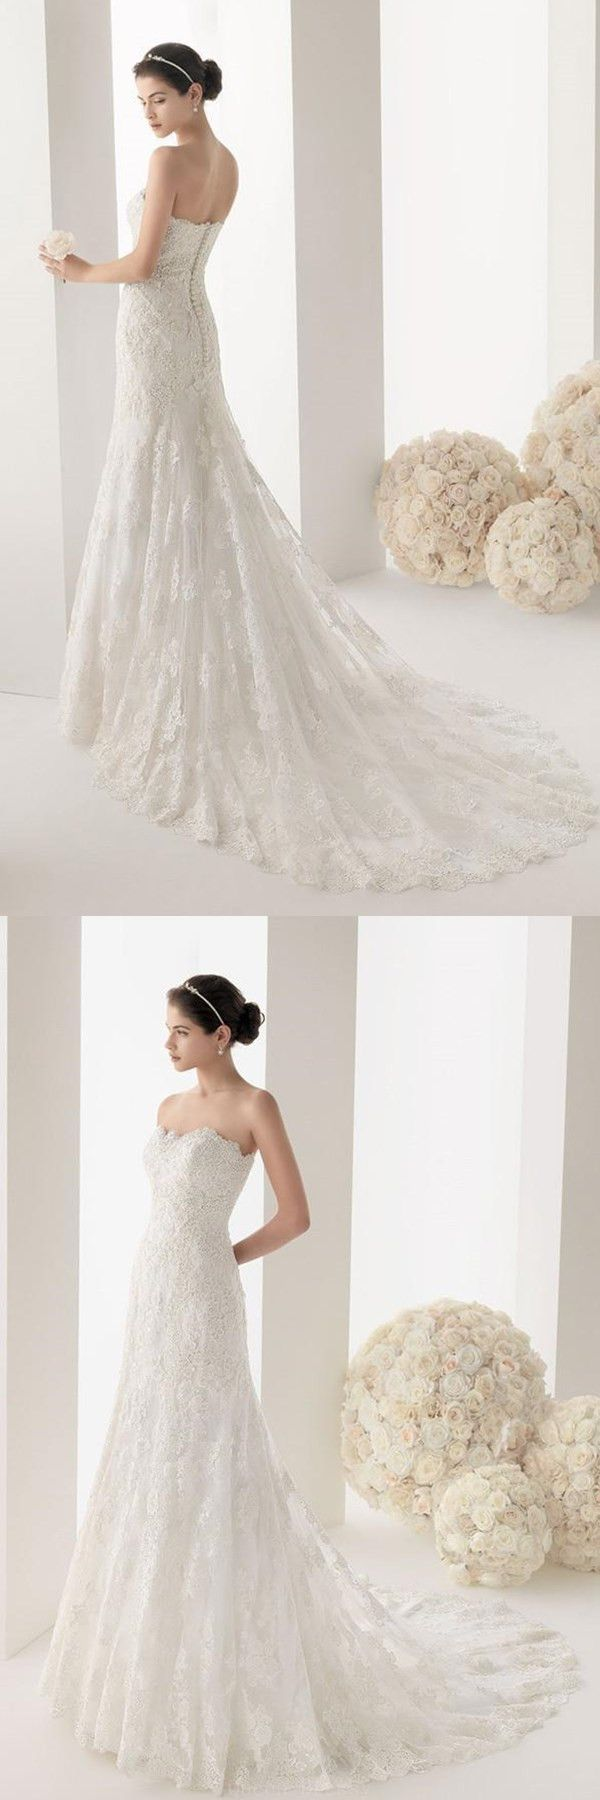 Admirable wedding dresses lace fashion off shoulder sleeve wedding